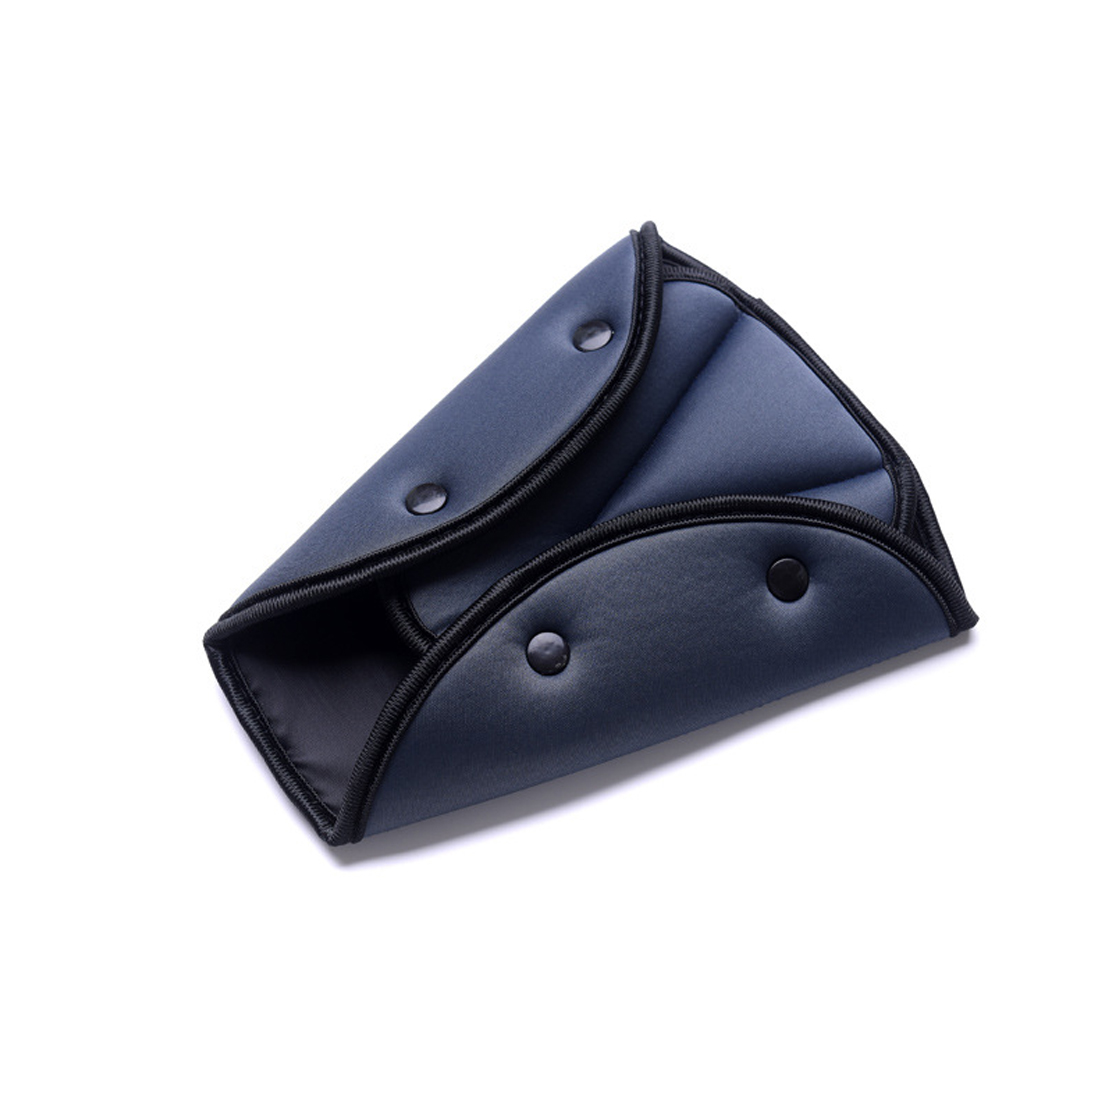 Dewtreetali new Car Safe Fit Seat Belt Sturdy Adjuster Car Safety Belt Adjust Device Triangle Baby Child Protection Baby Safety